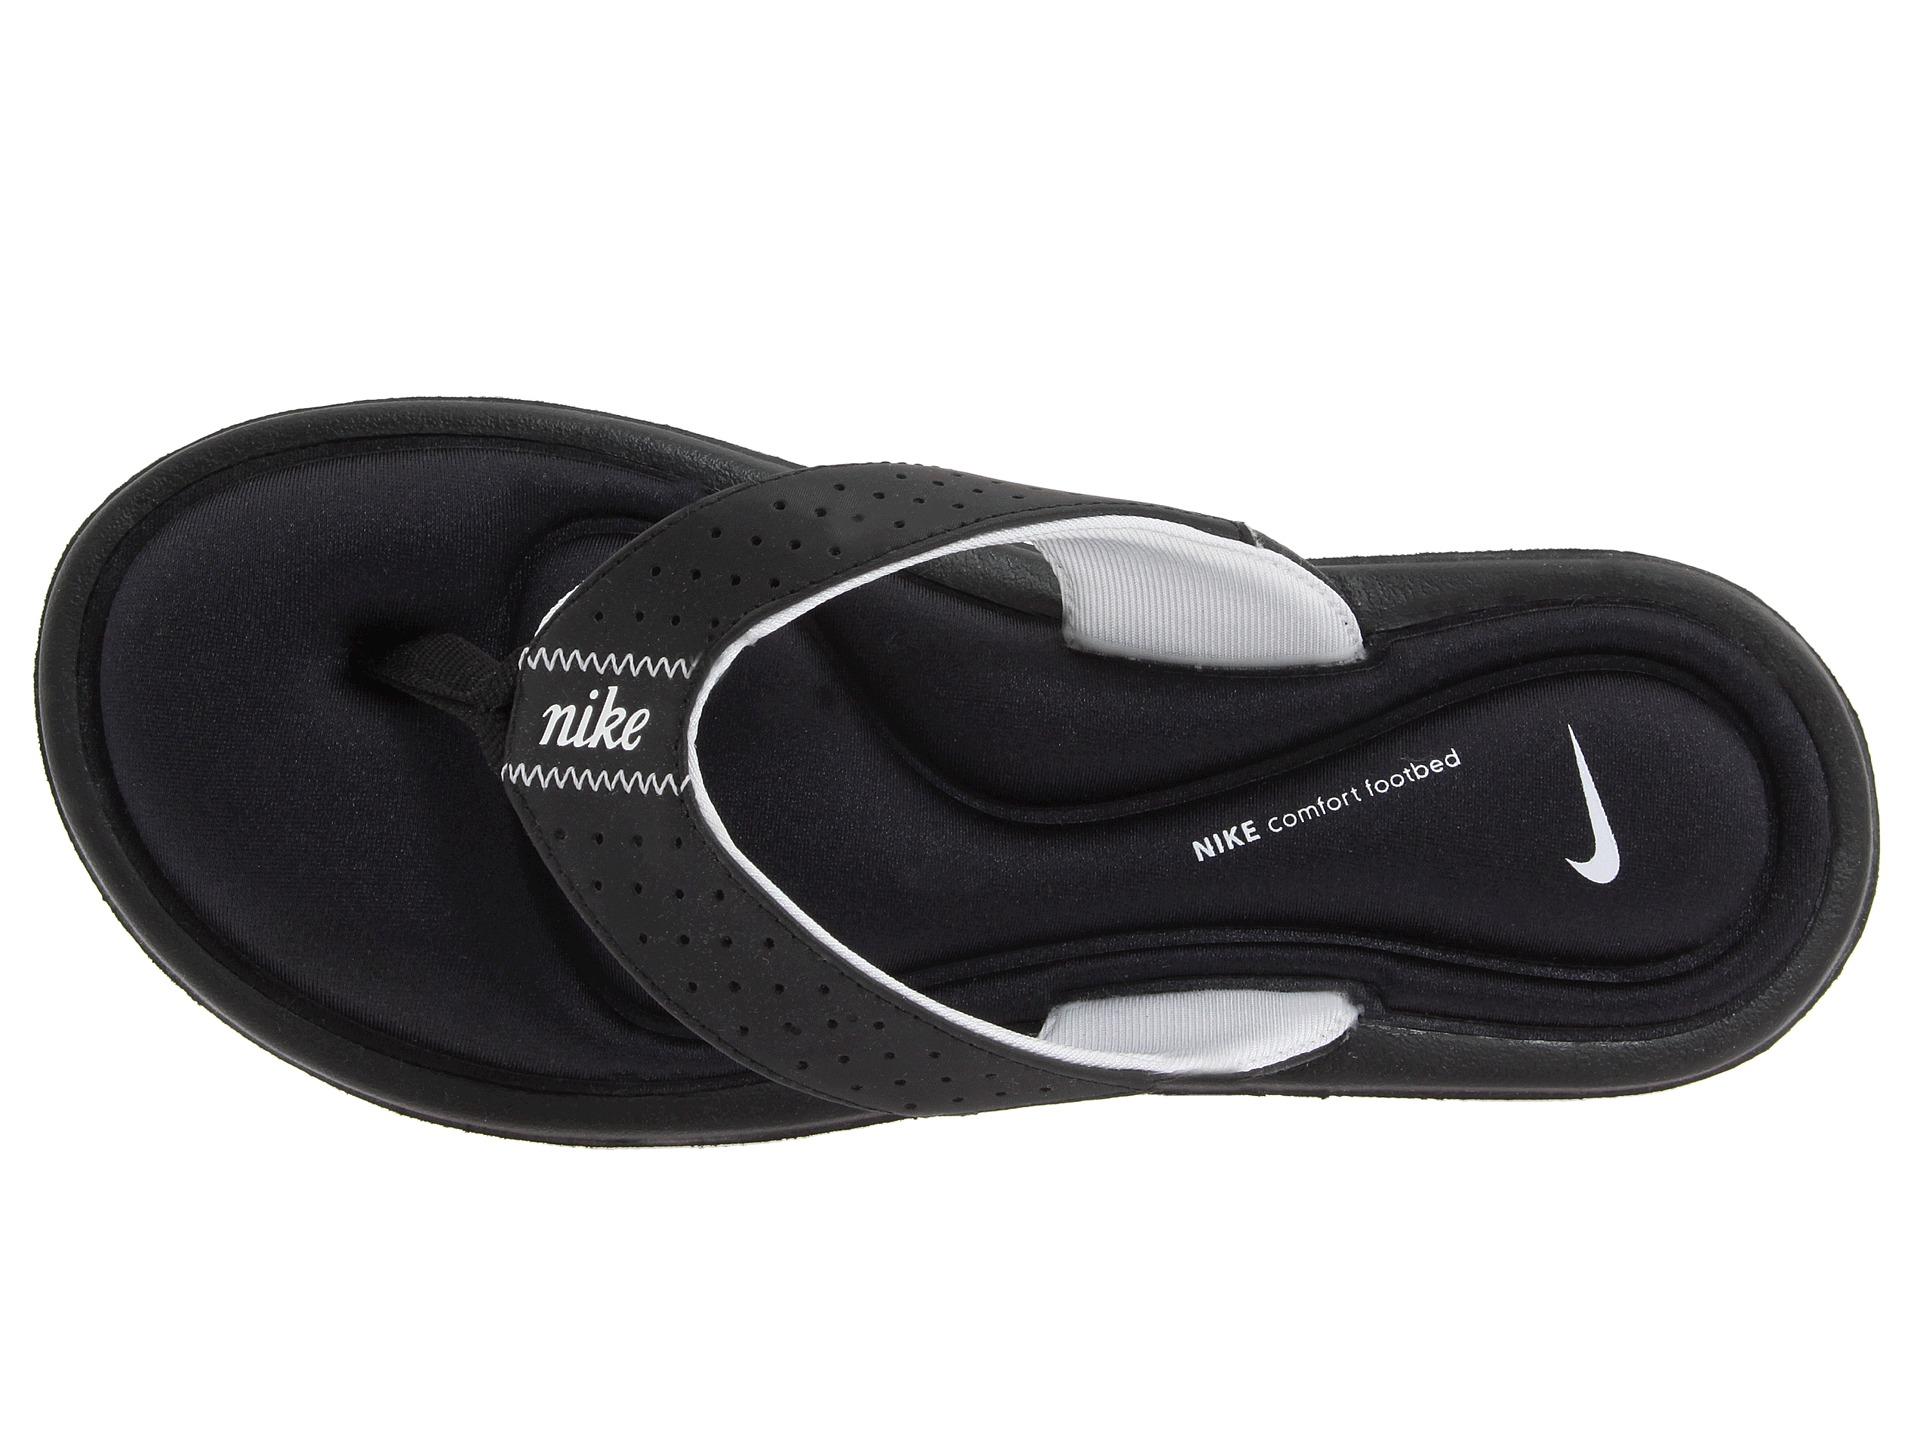 nike comfort footbed flip flops mens